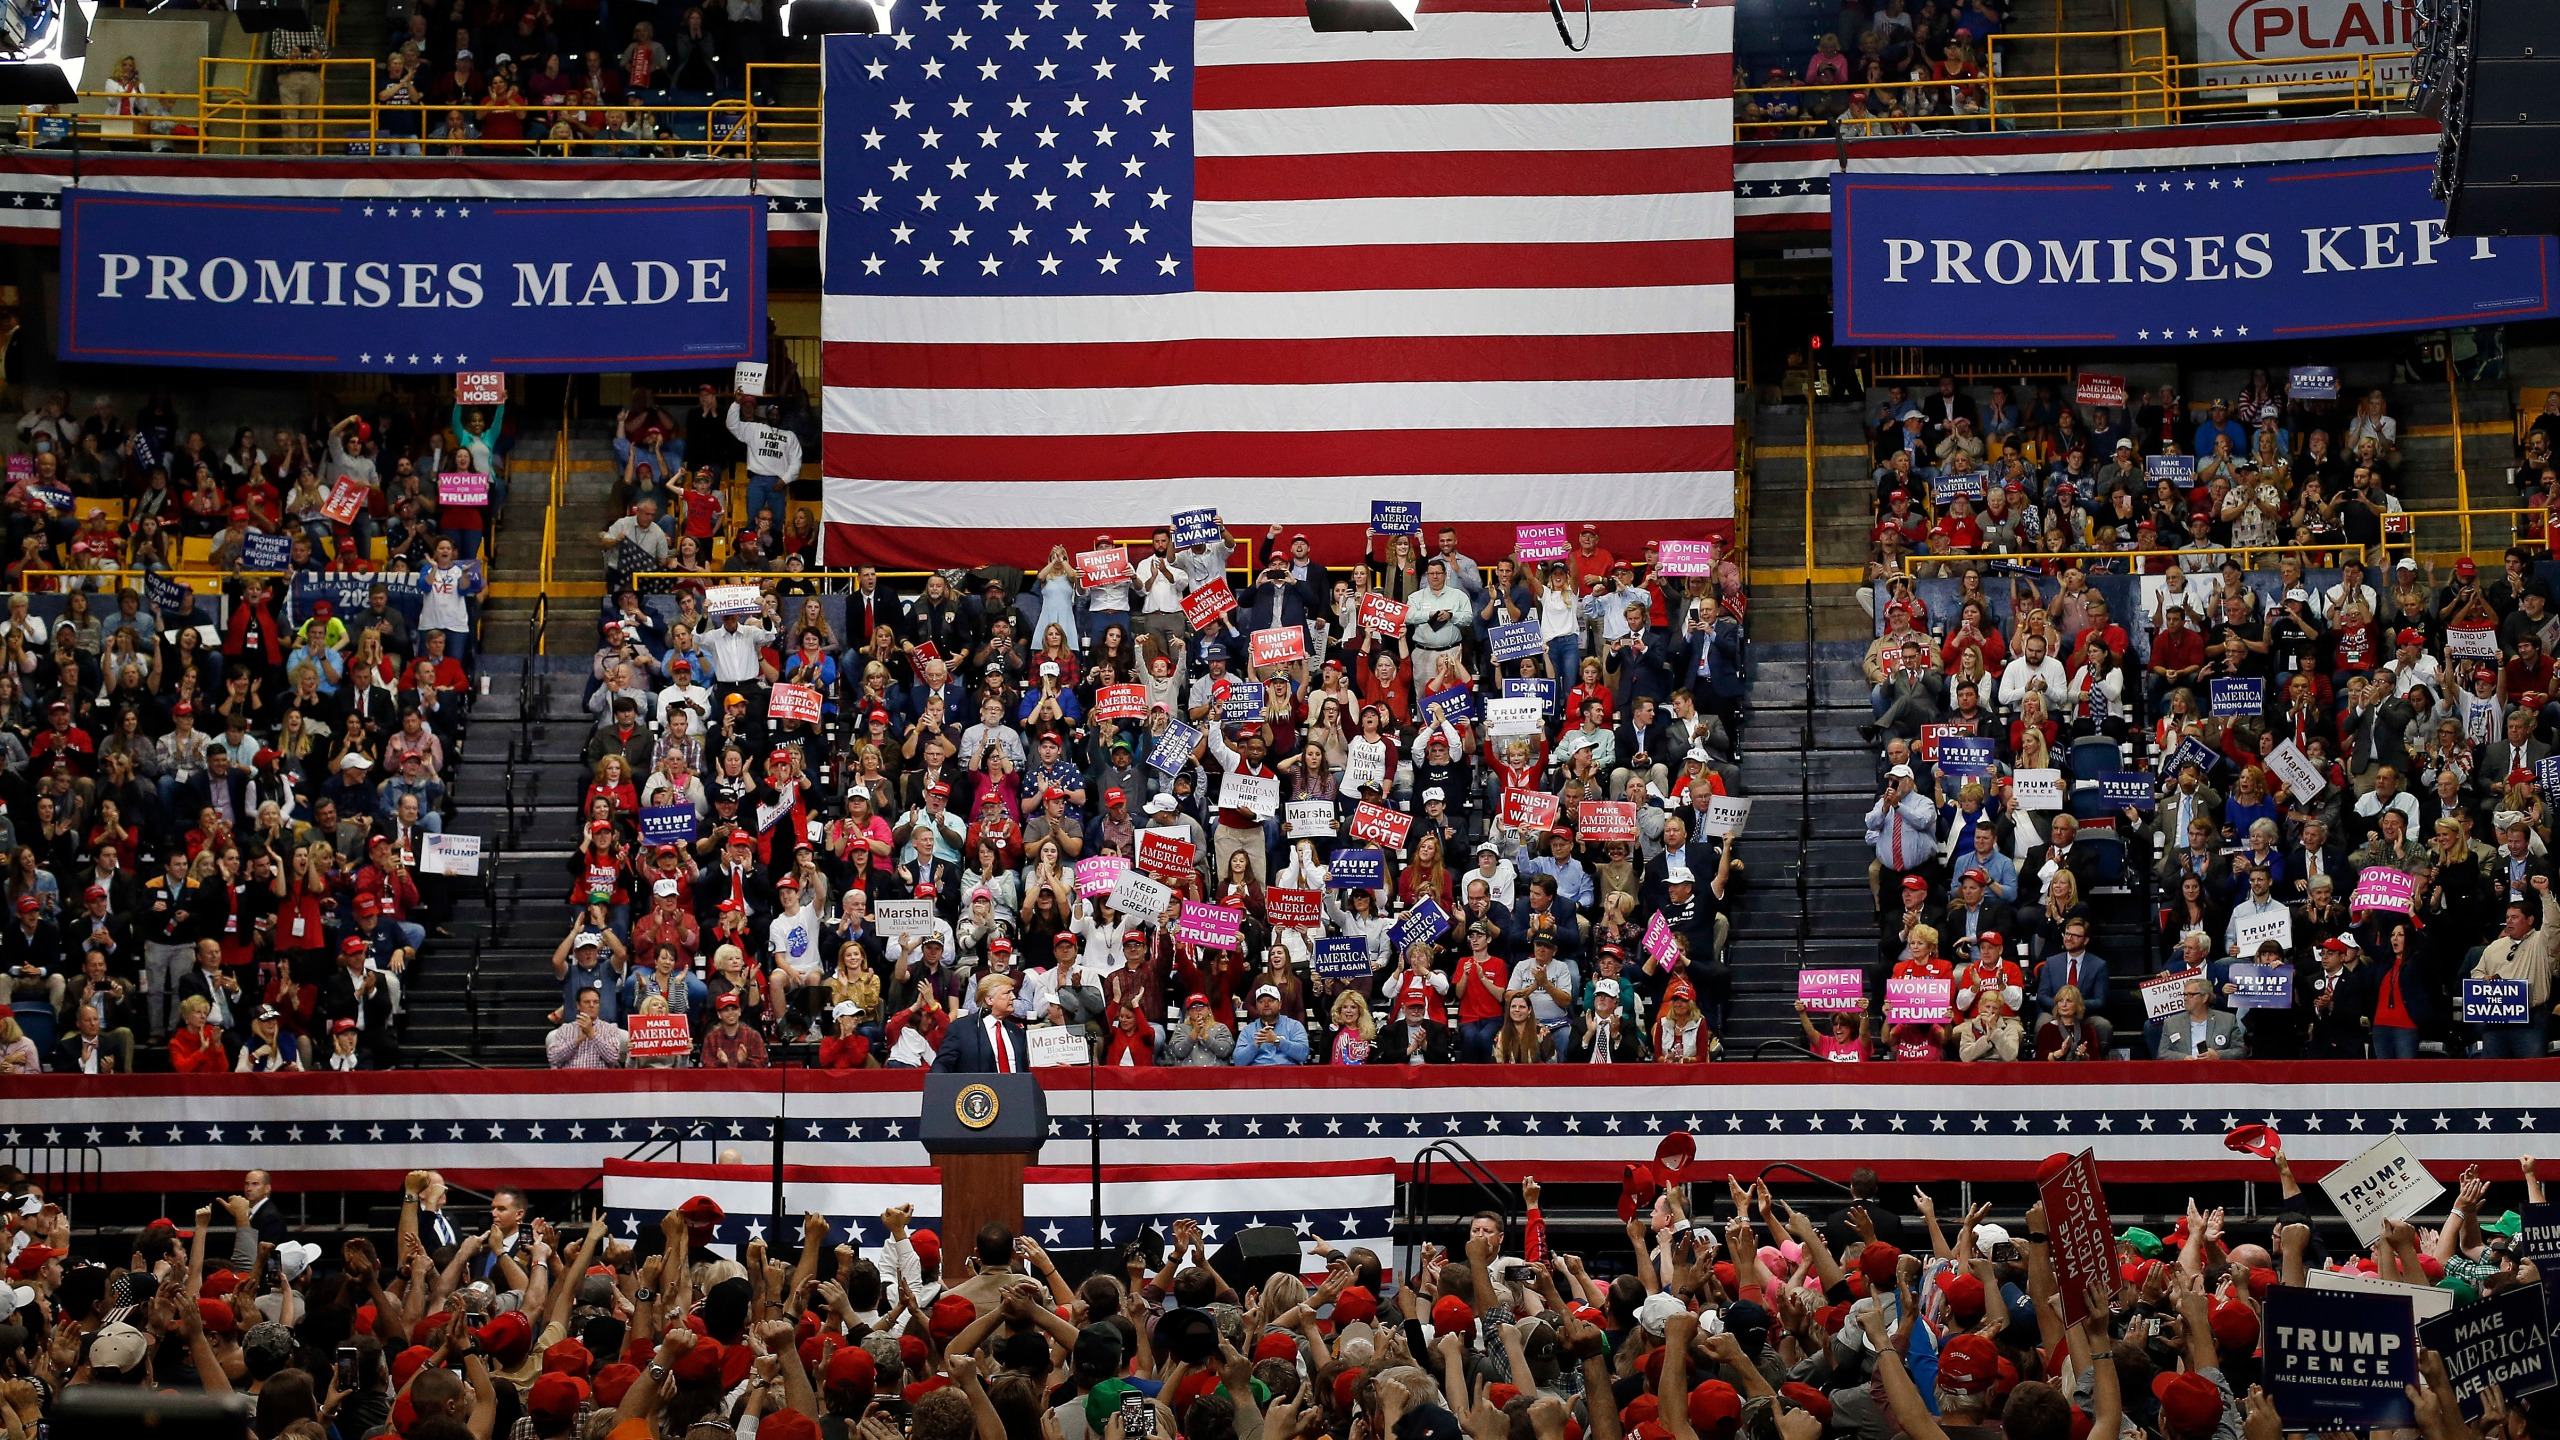 Election_2018_Trump_26496-159532.jpg00797454